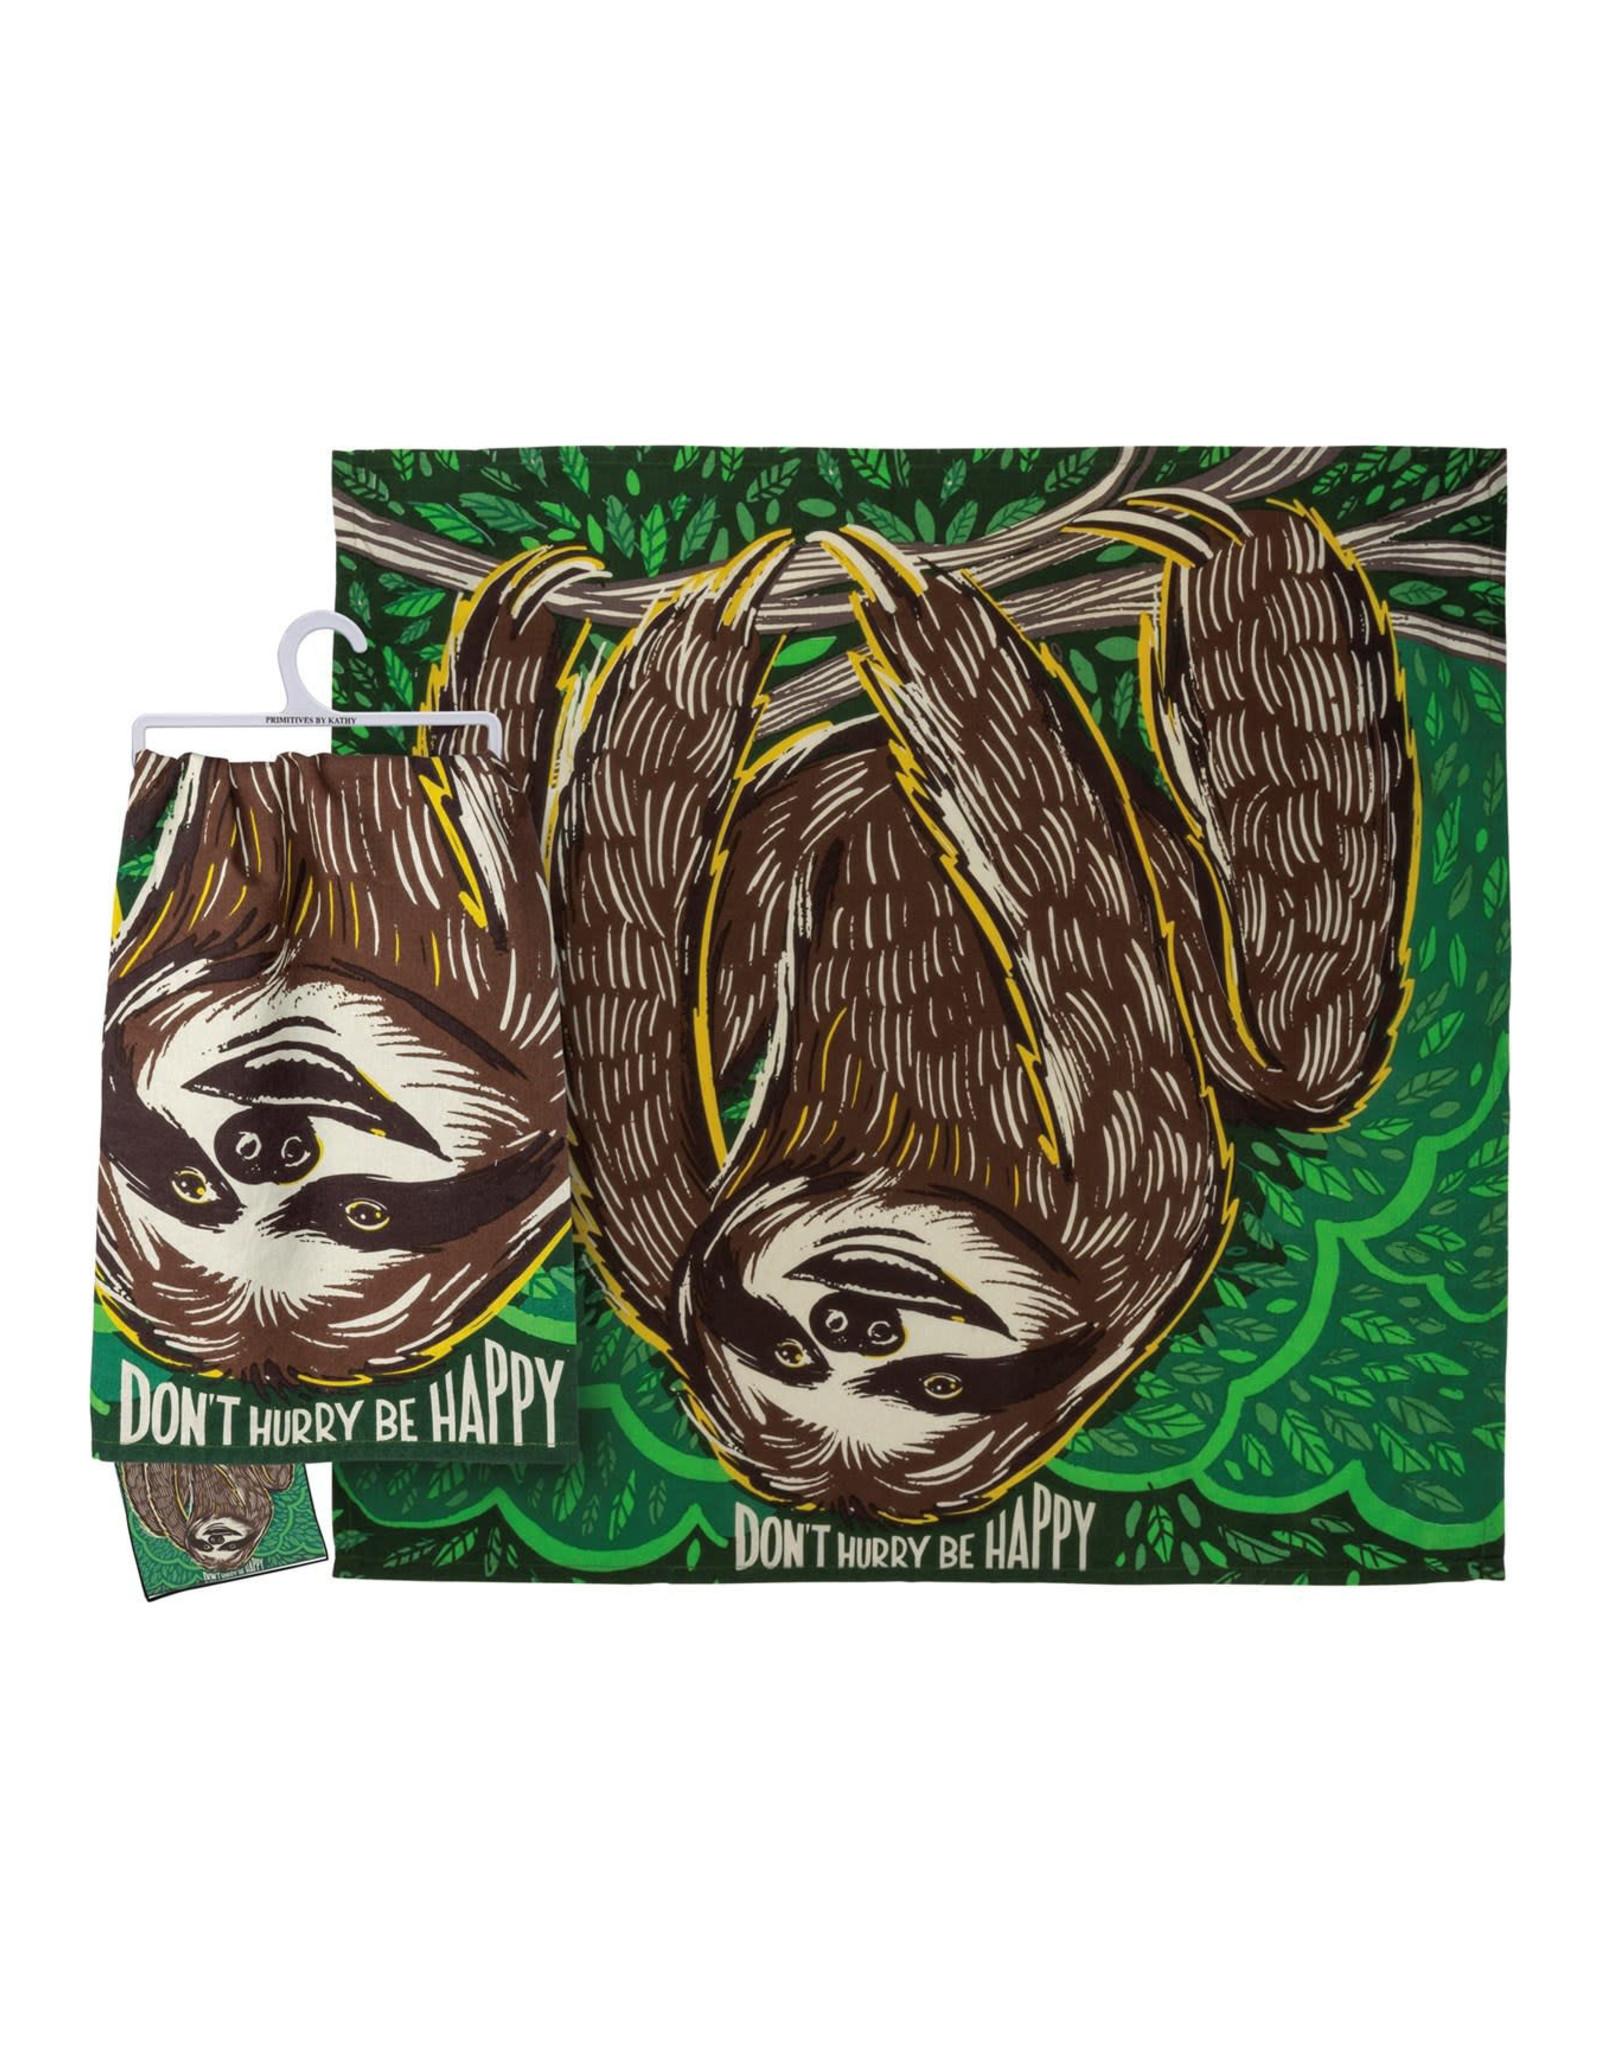 Don't Hurry Be Happy (Sloth) Dish Towel